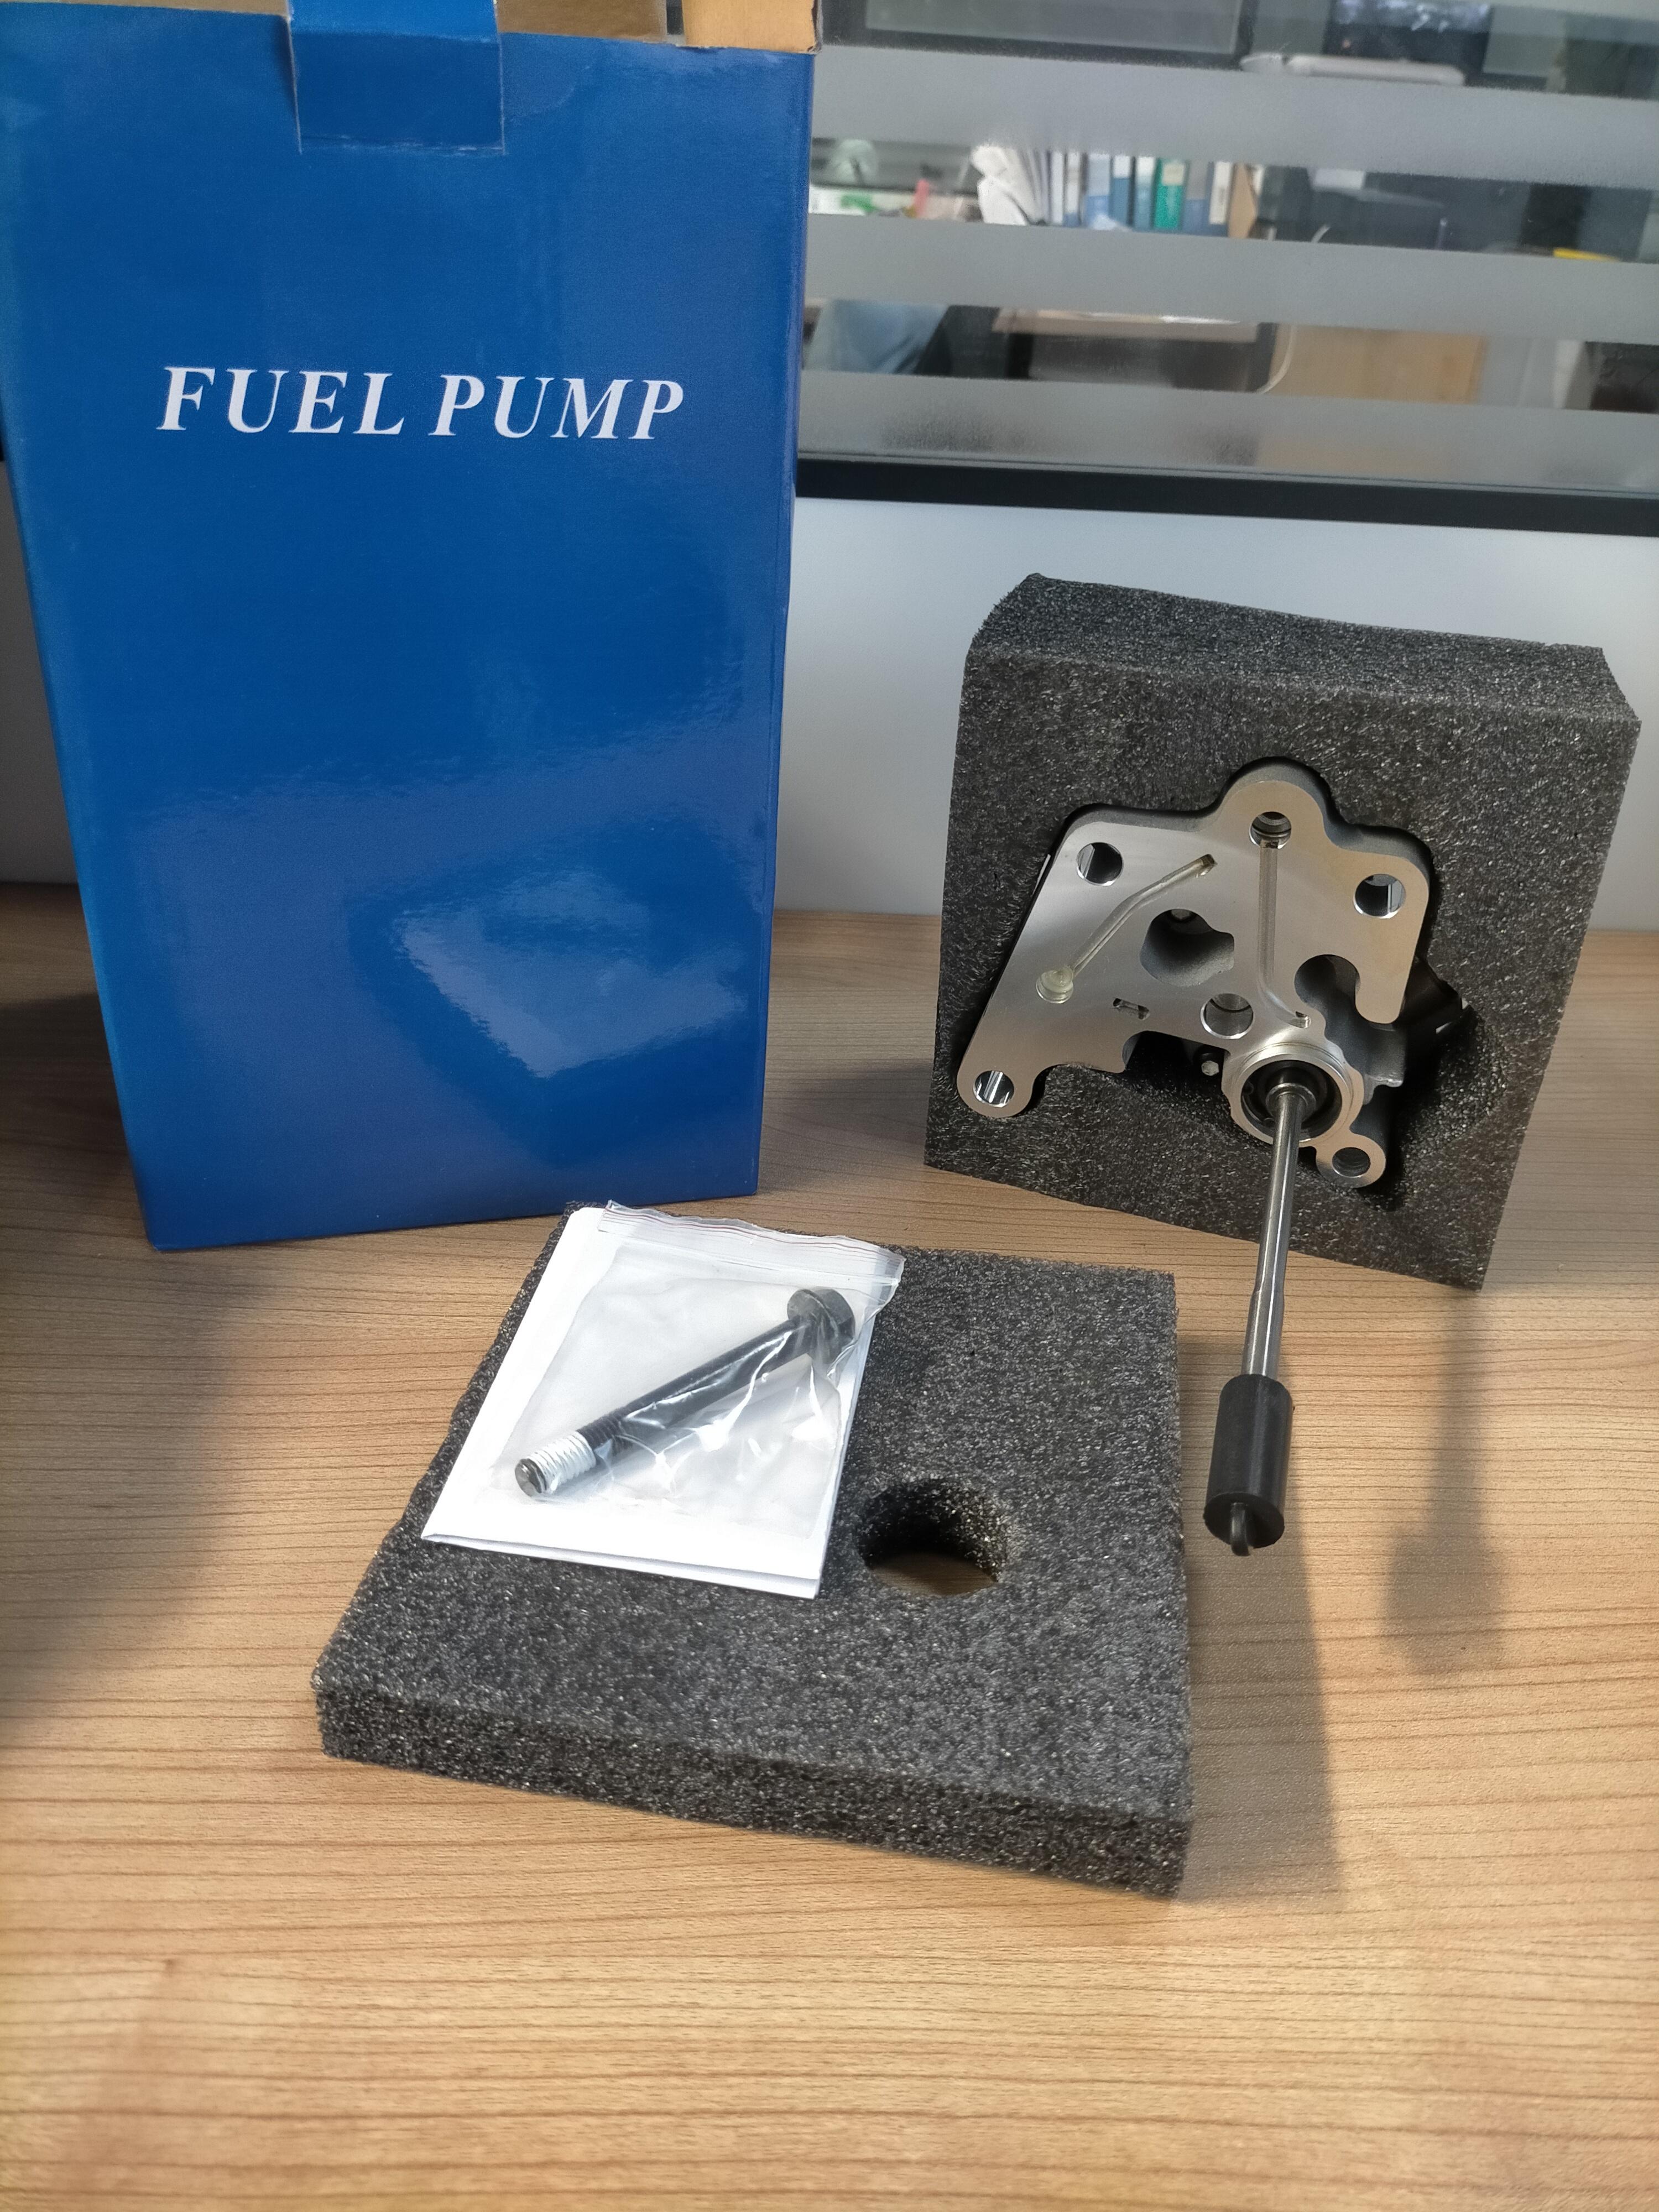 Fuel Pump 20441871 21067551 21067955 20752310 20411997 21067955 20440372 20769469 3065985 For VOLVO Truck Gear Pump